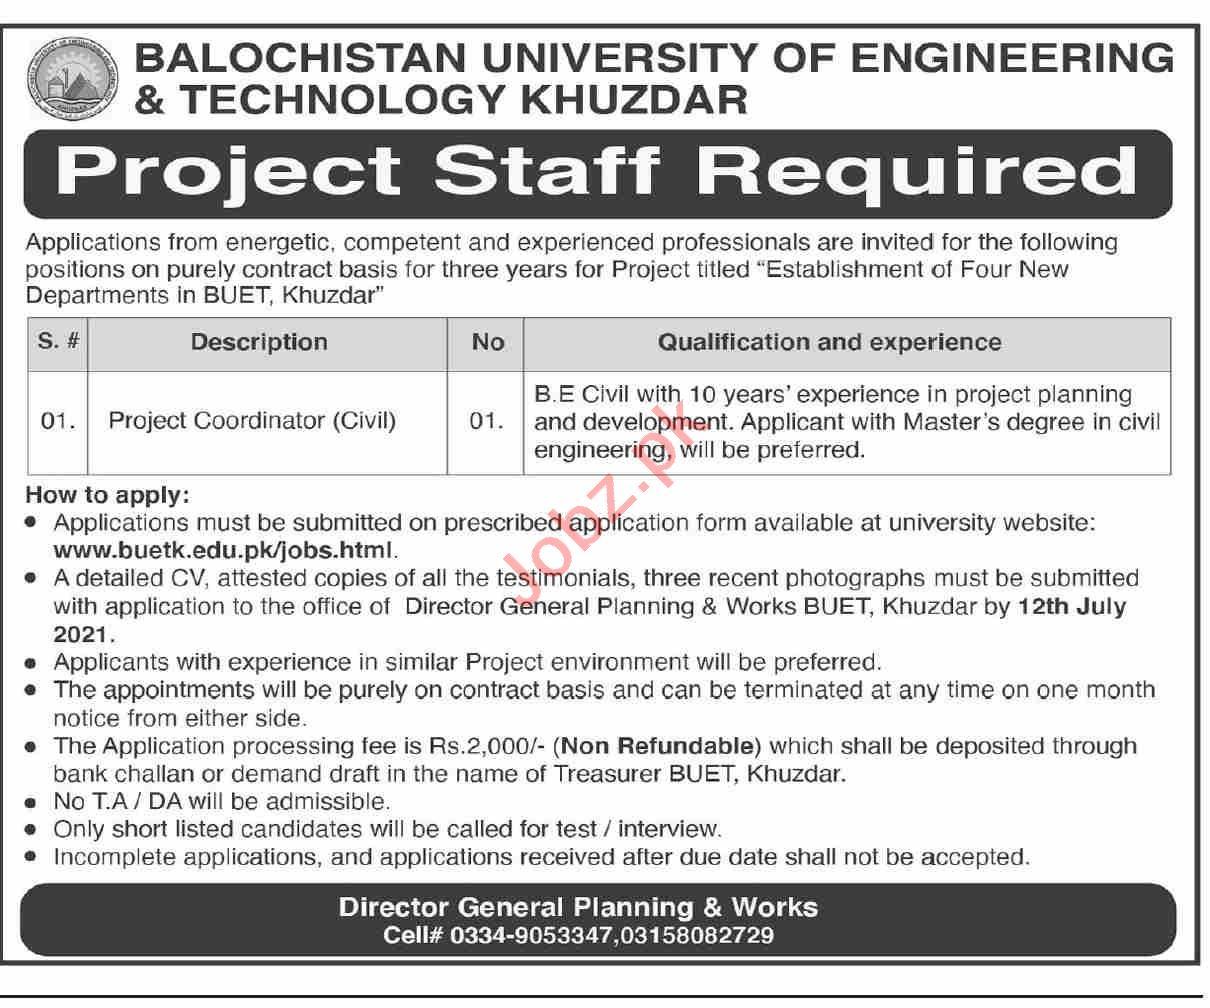 Balochistan University of Engineering & Technology BUET Jobs